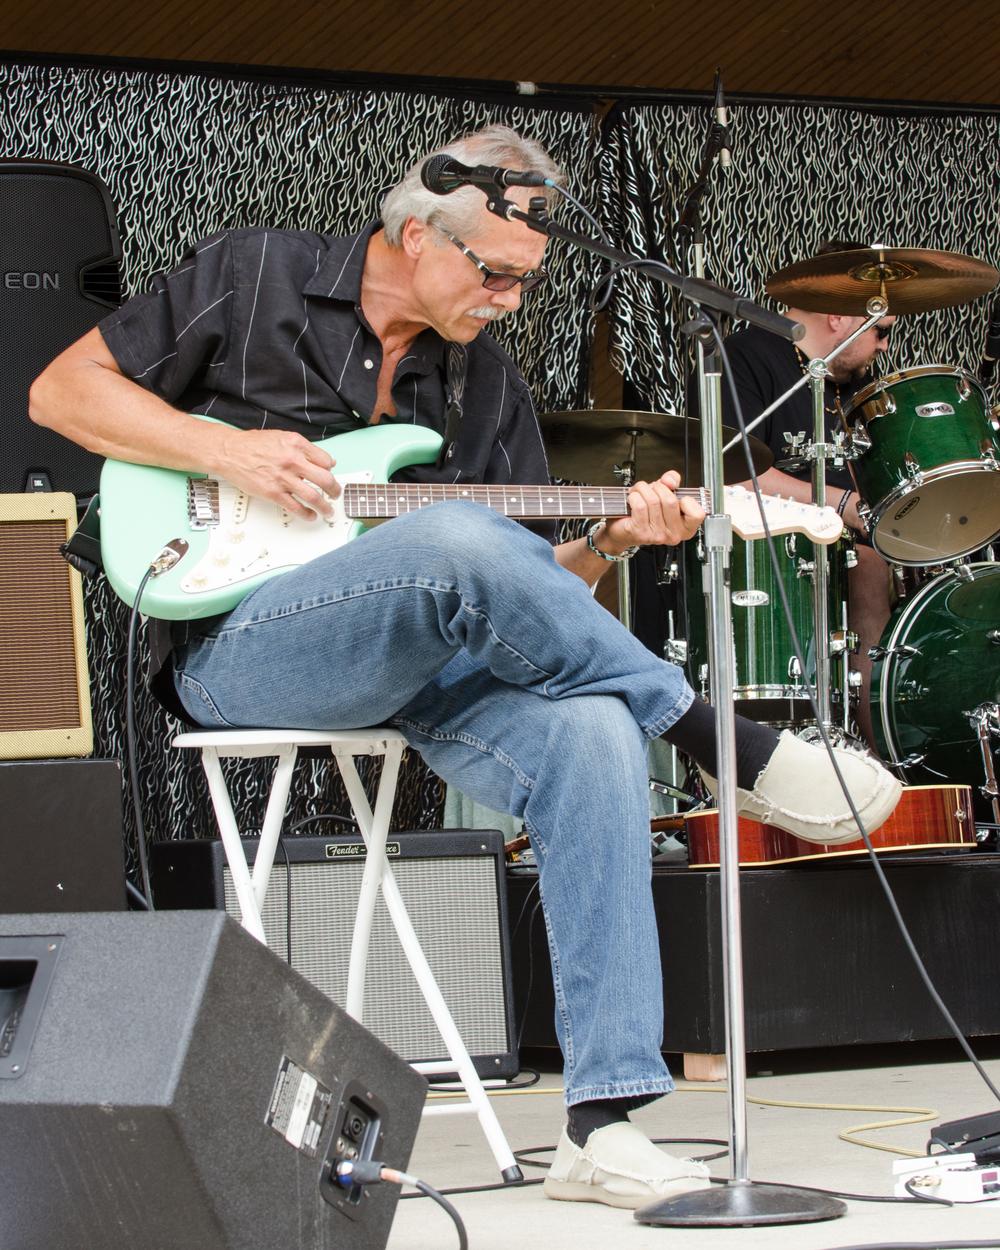 Fleetwood_Blues_Festival_2013-08-11_-122.jpg